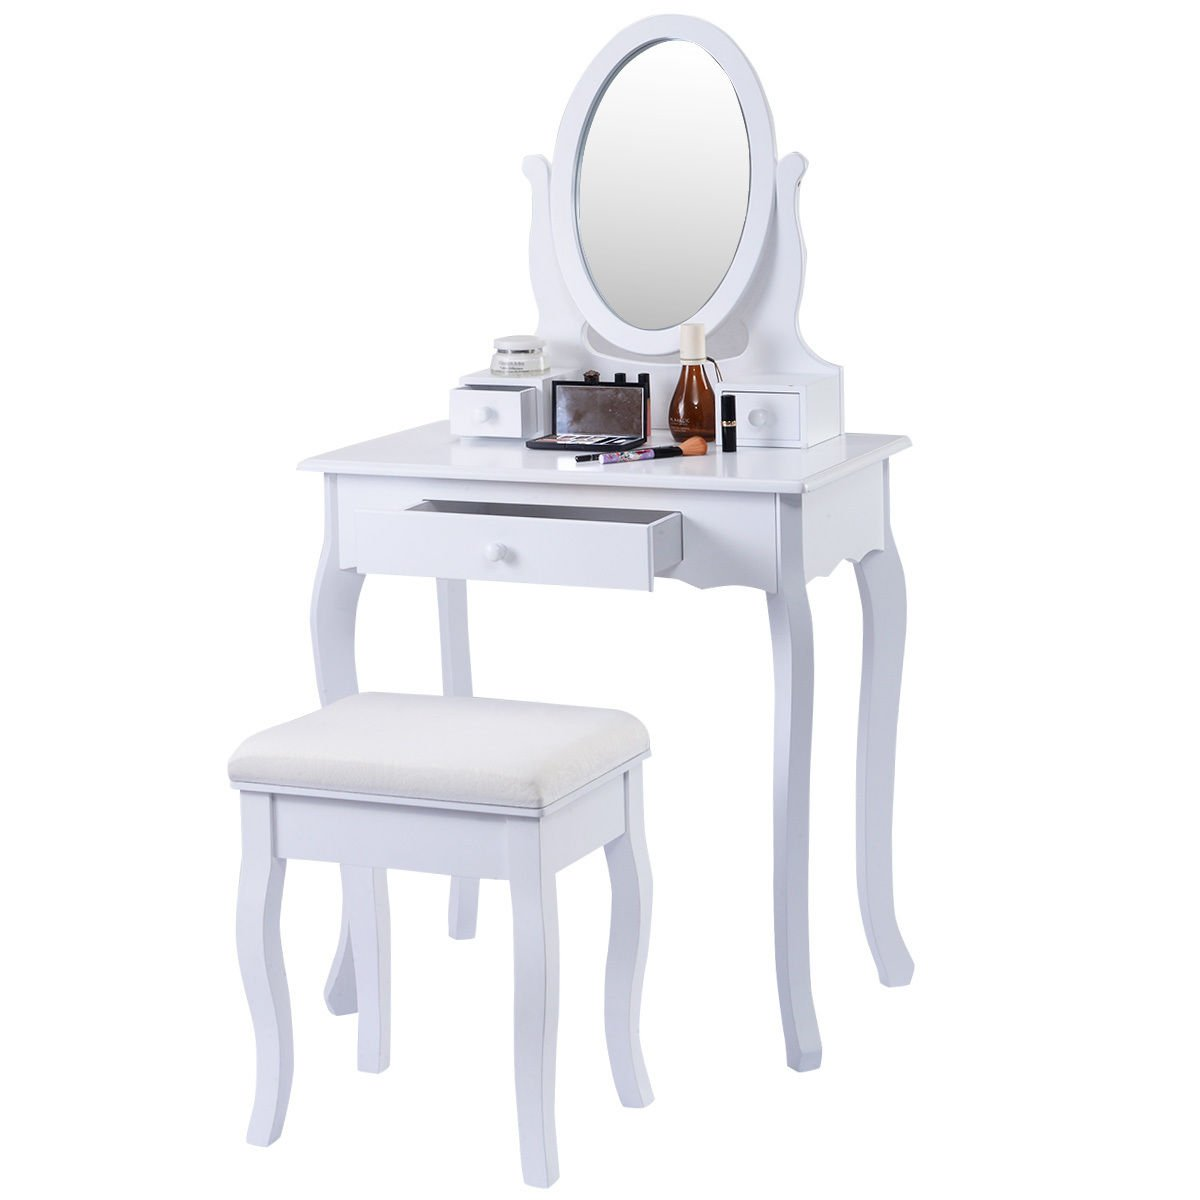 Furinho Bush - White Vanity Table Jewelry Makeup Desk Bench Dresser w/ Stool 3 Drawers YRS 1227